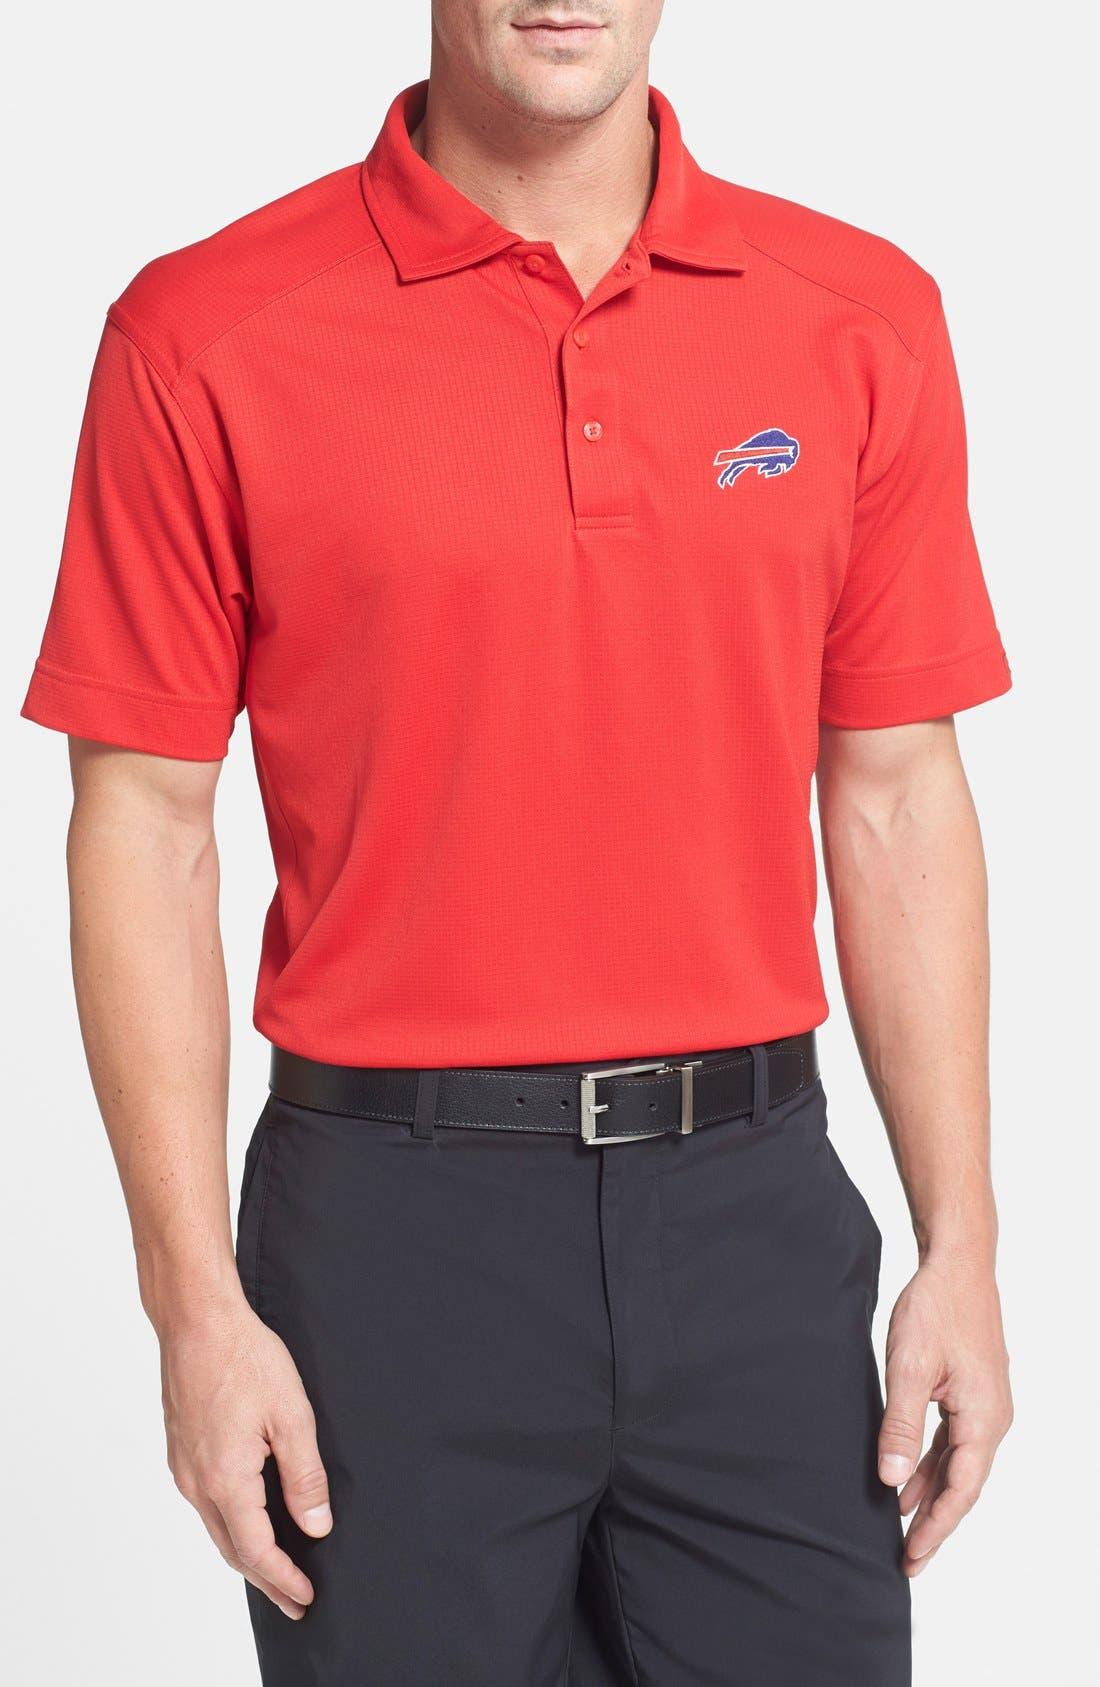 Buffalo Bills - Genre DryTec Moisture Wicking Polo,                             Main thumbnail 1, color,                             Red